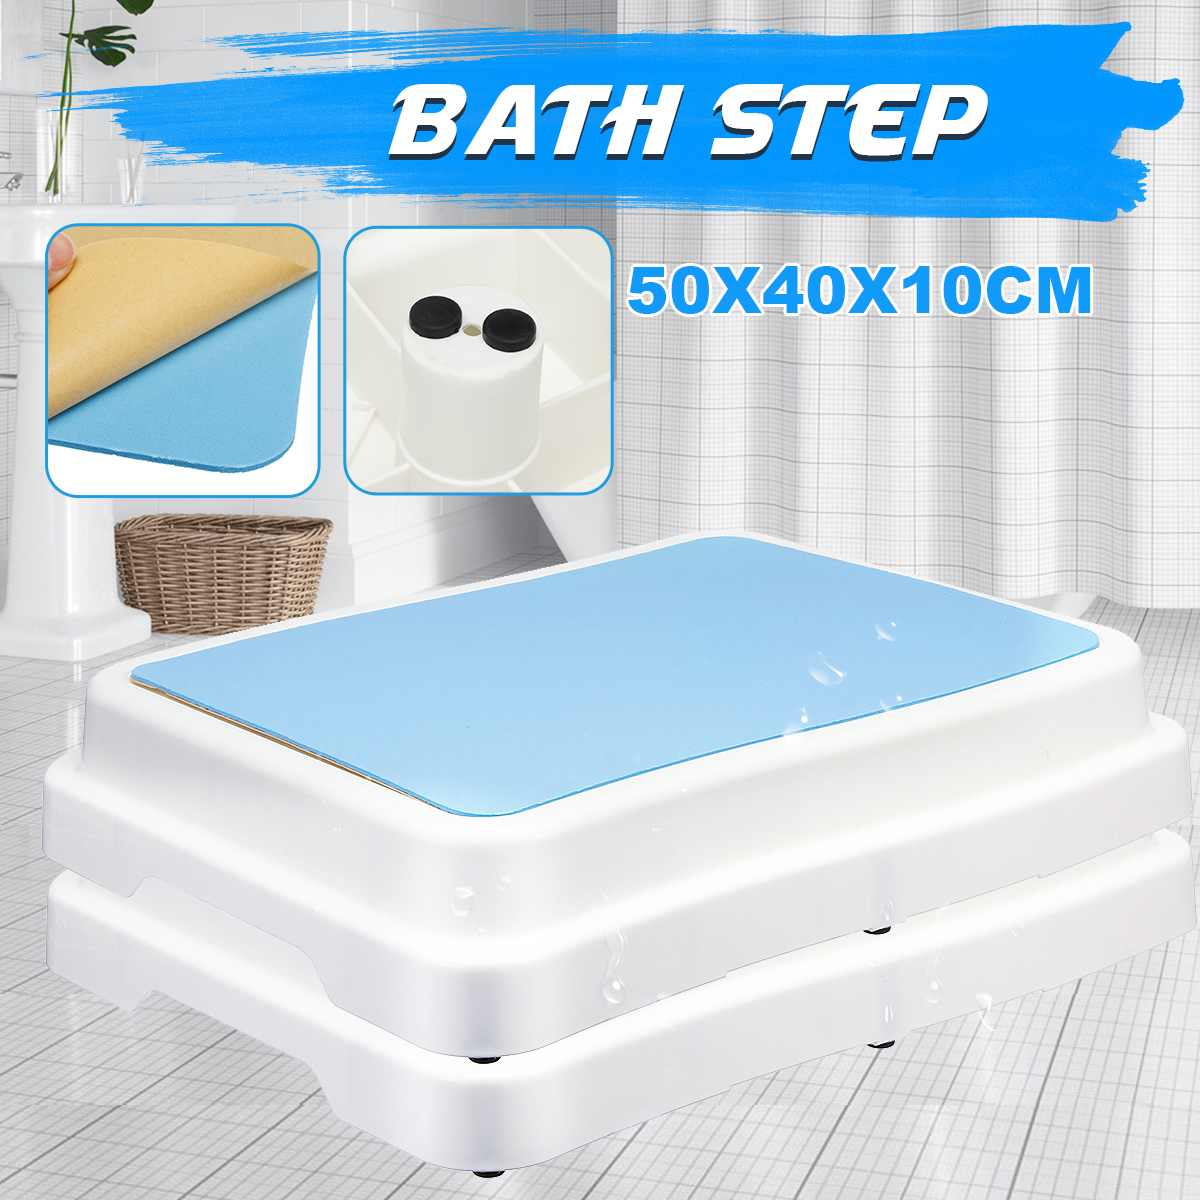 Stackable Bench Stool EVA Bathroom Feeding Hand Washing Bath Stepping Footstool Old Man Baby Non-slip Foot Stool Large Platform